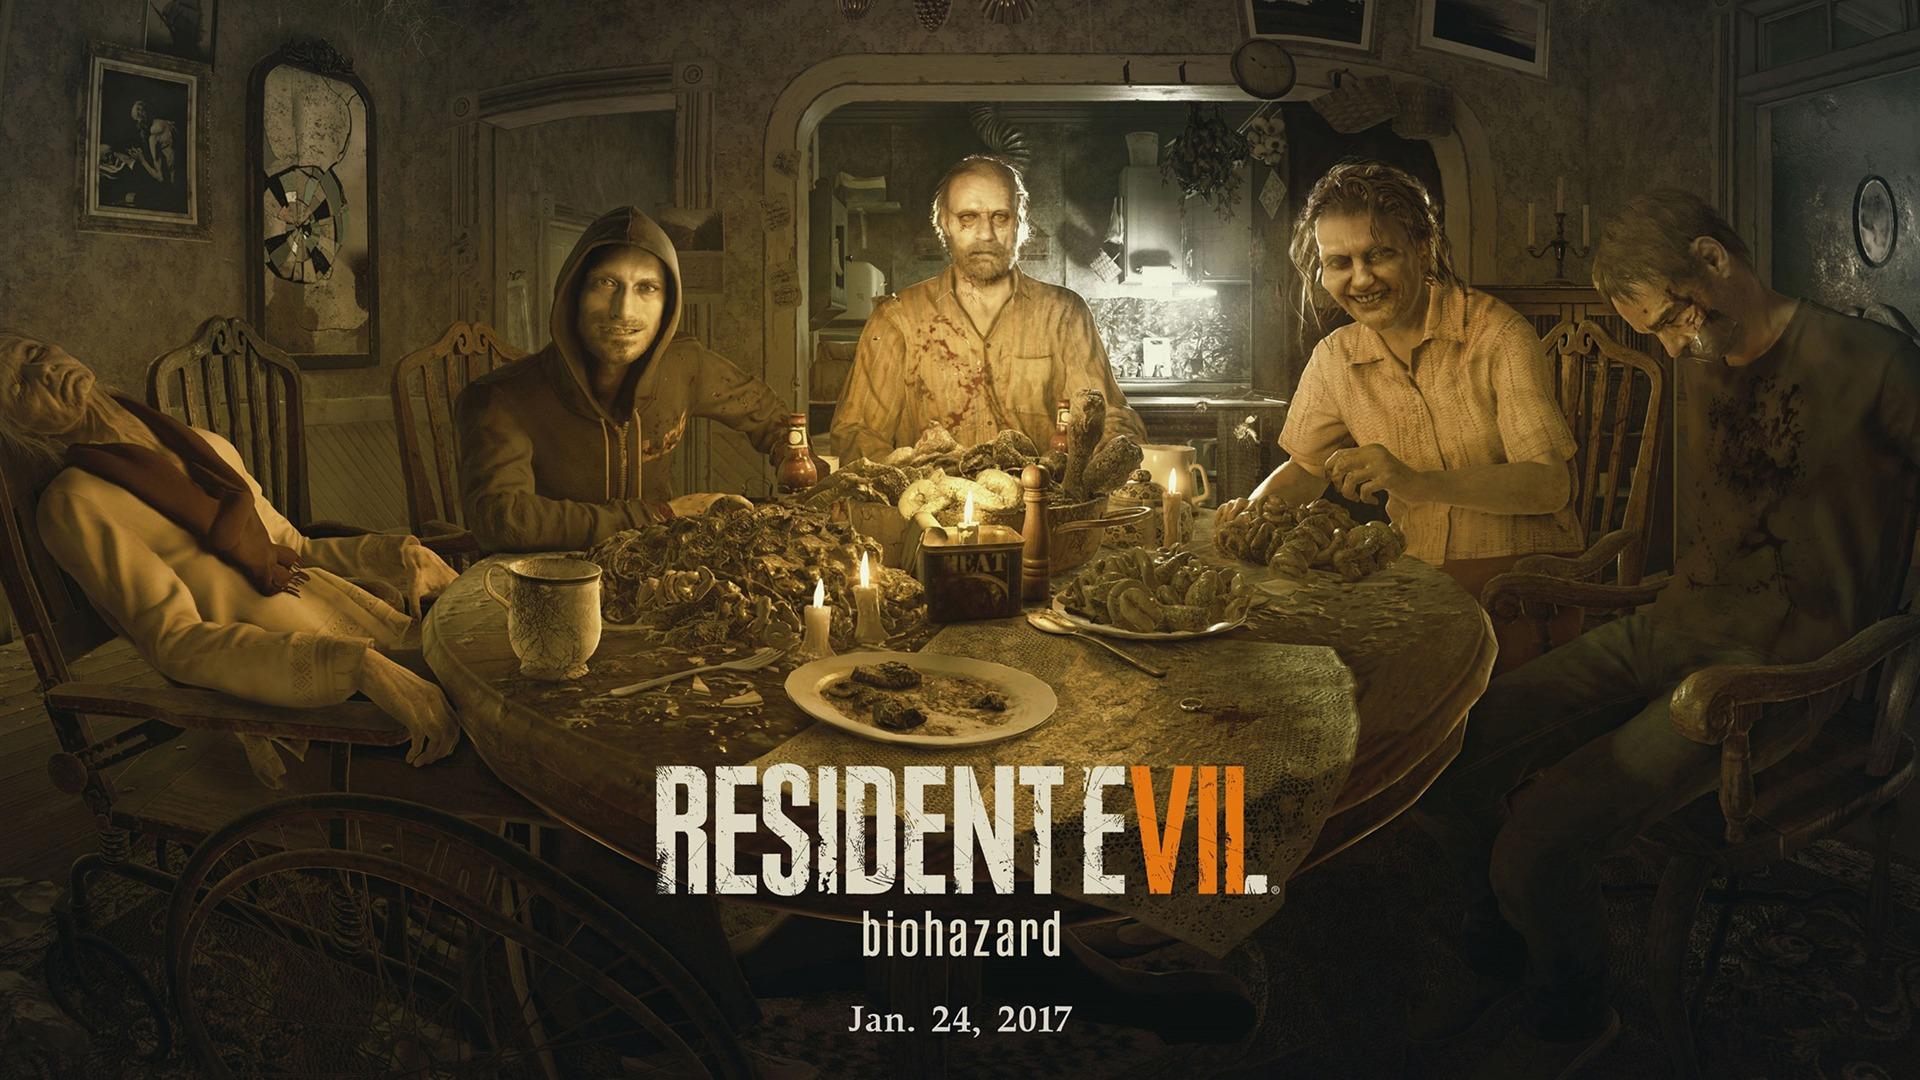 Resident evil 7 biohazard 2017-2016 Game Poster HD ...